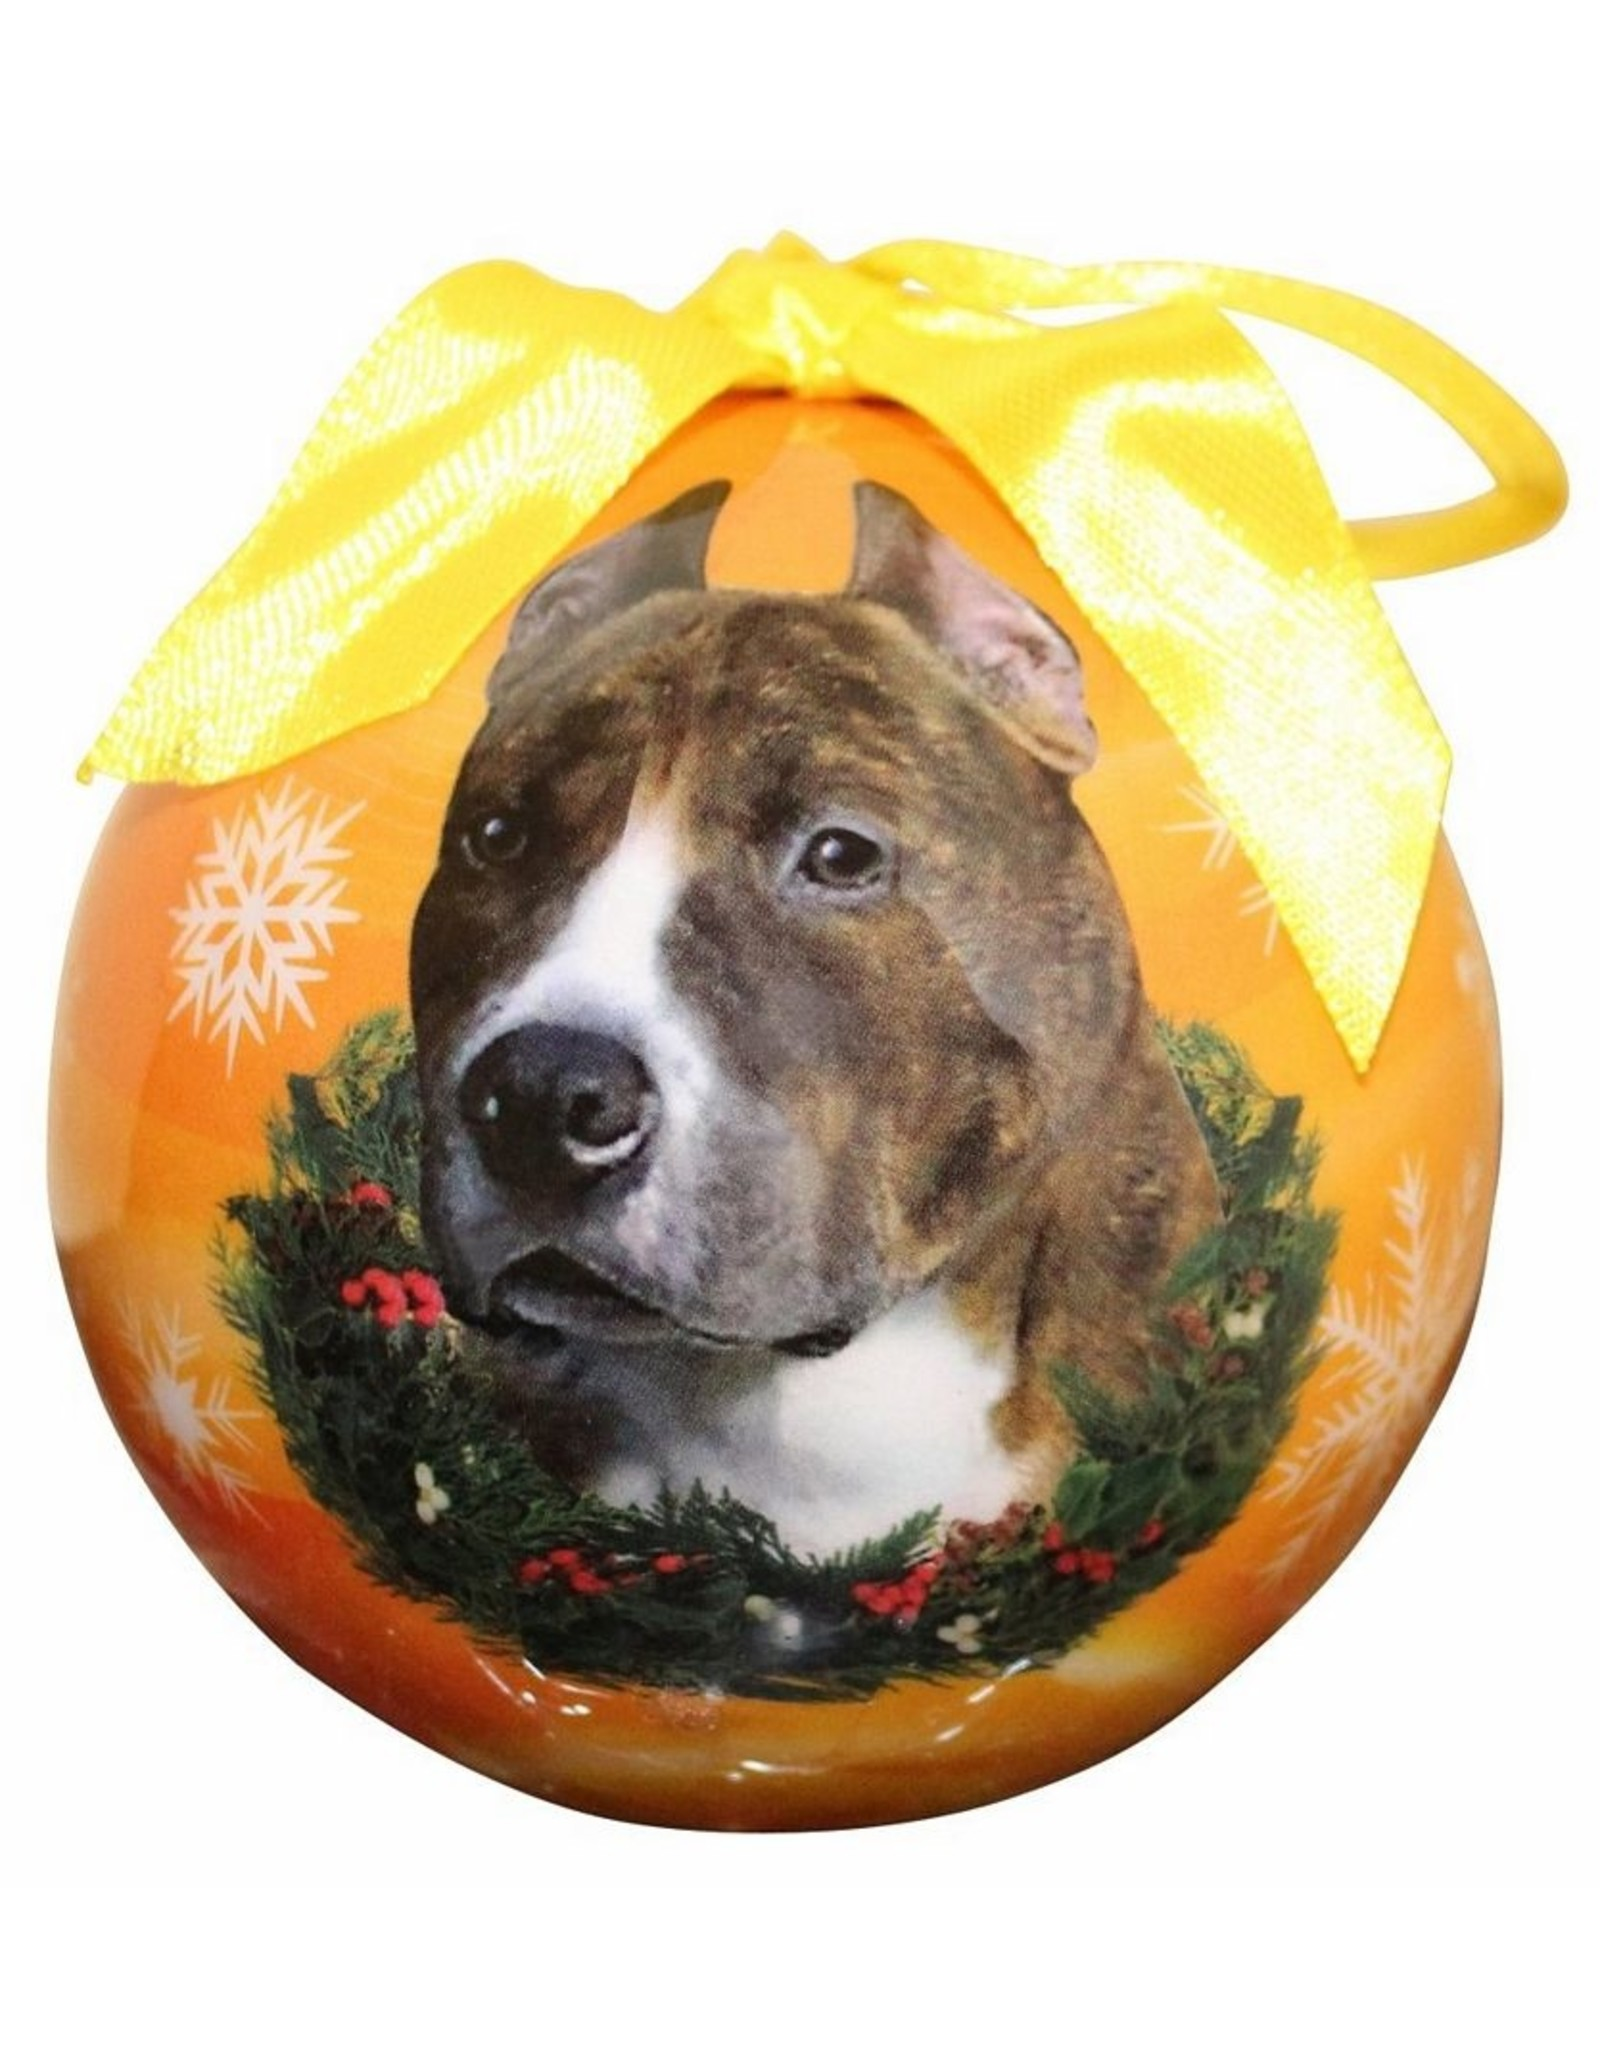 E&S Pets Brindle & White Pit Bull Ball Ornament